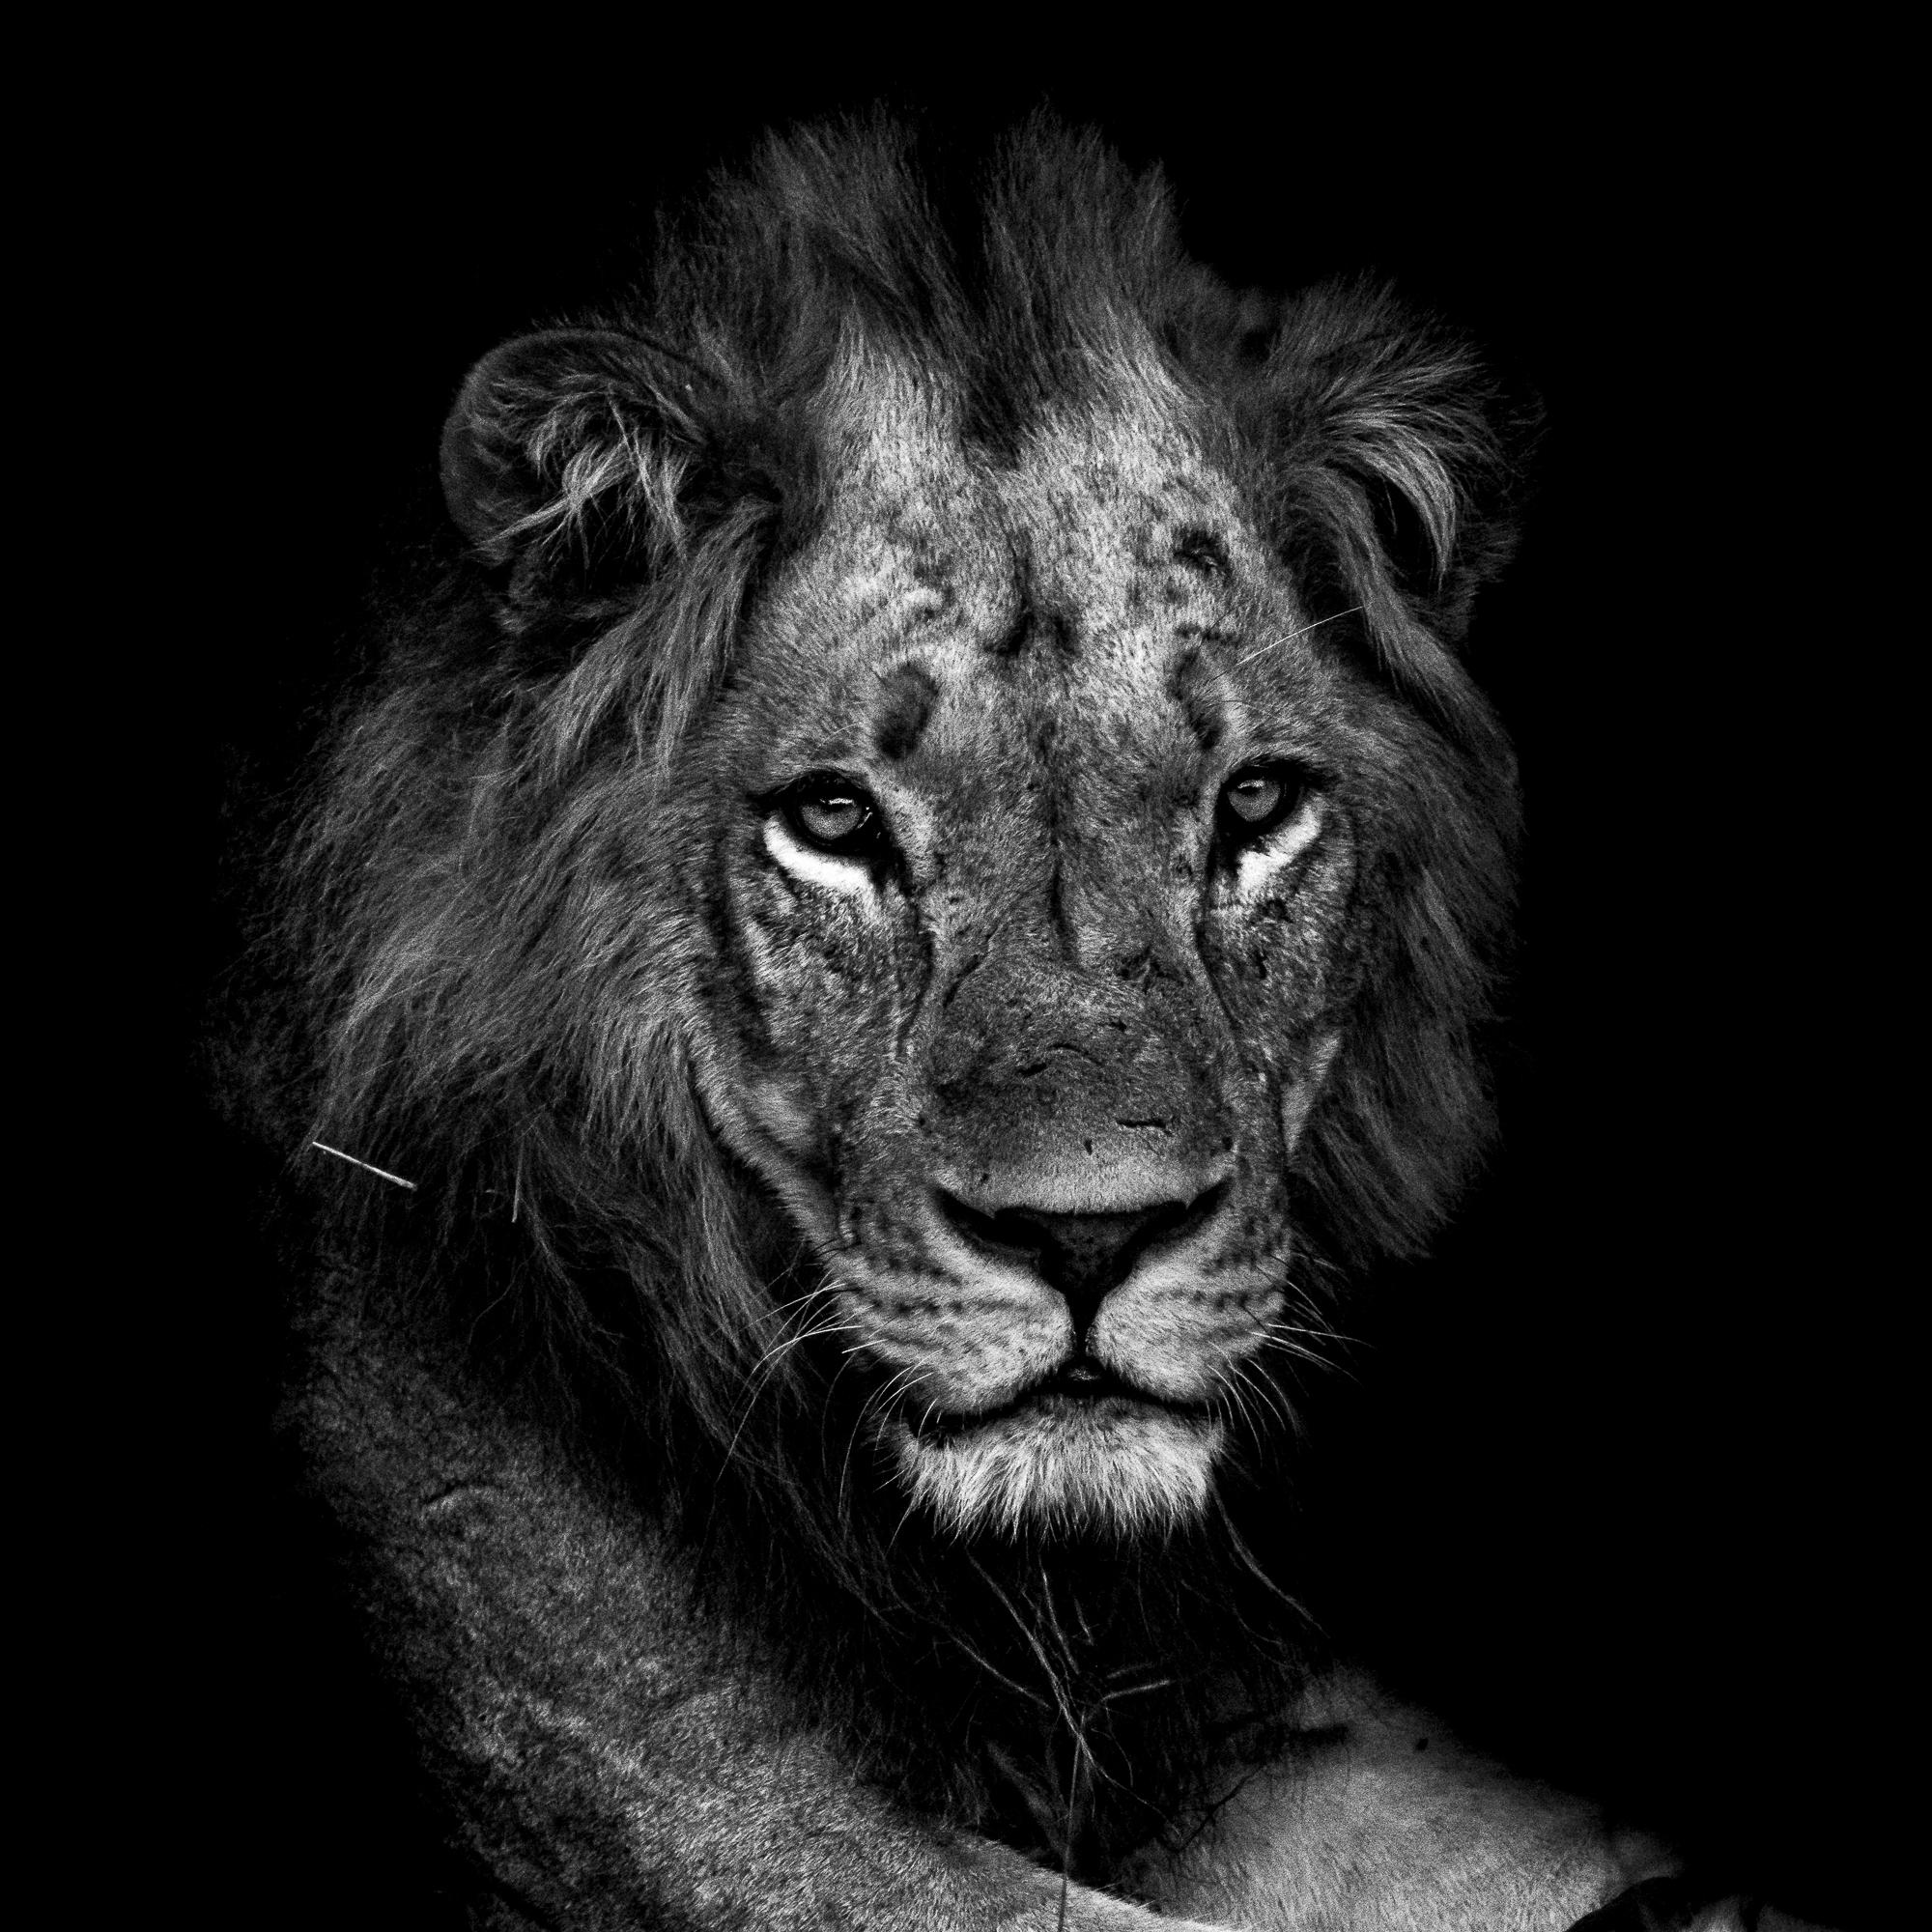 Ankit_Kumar_Lion_Head.jpg